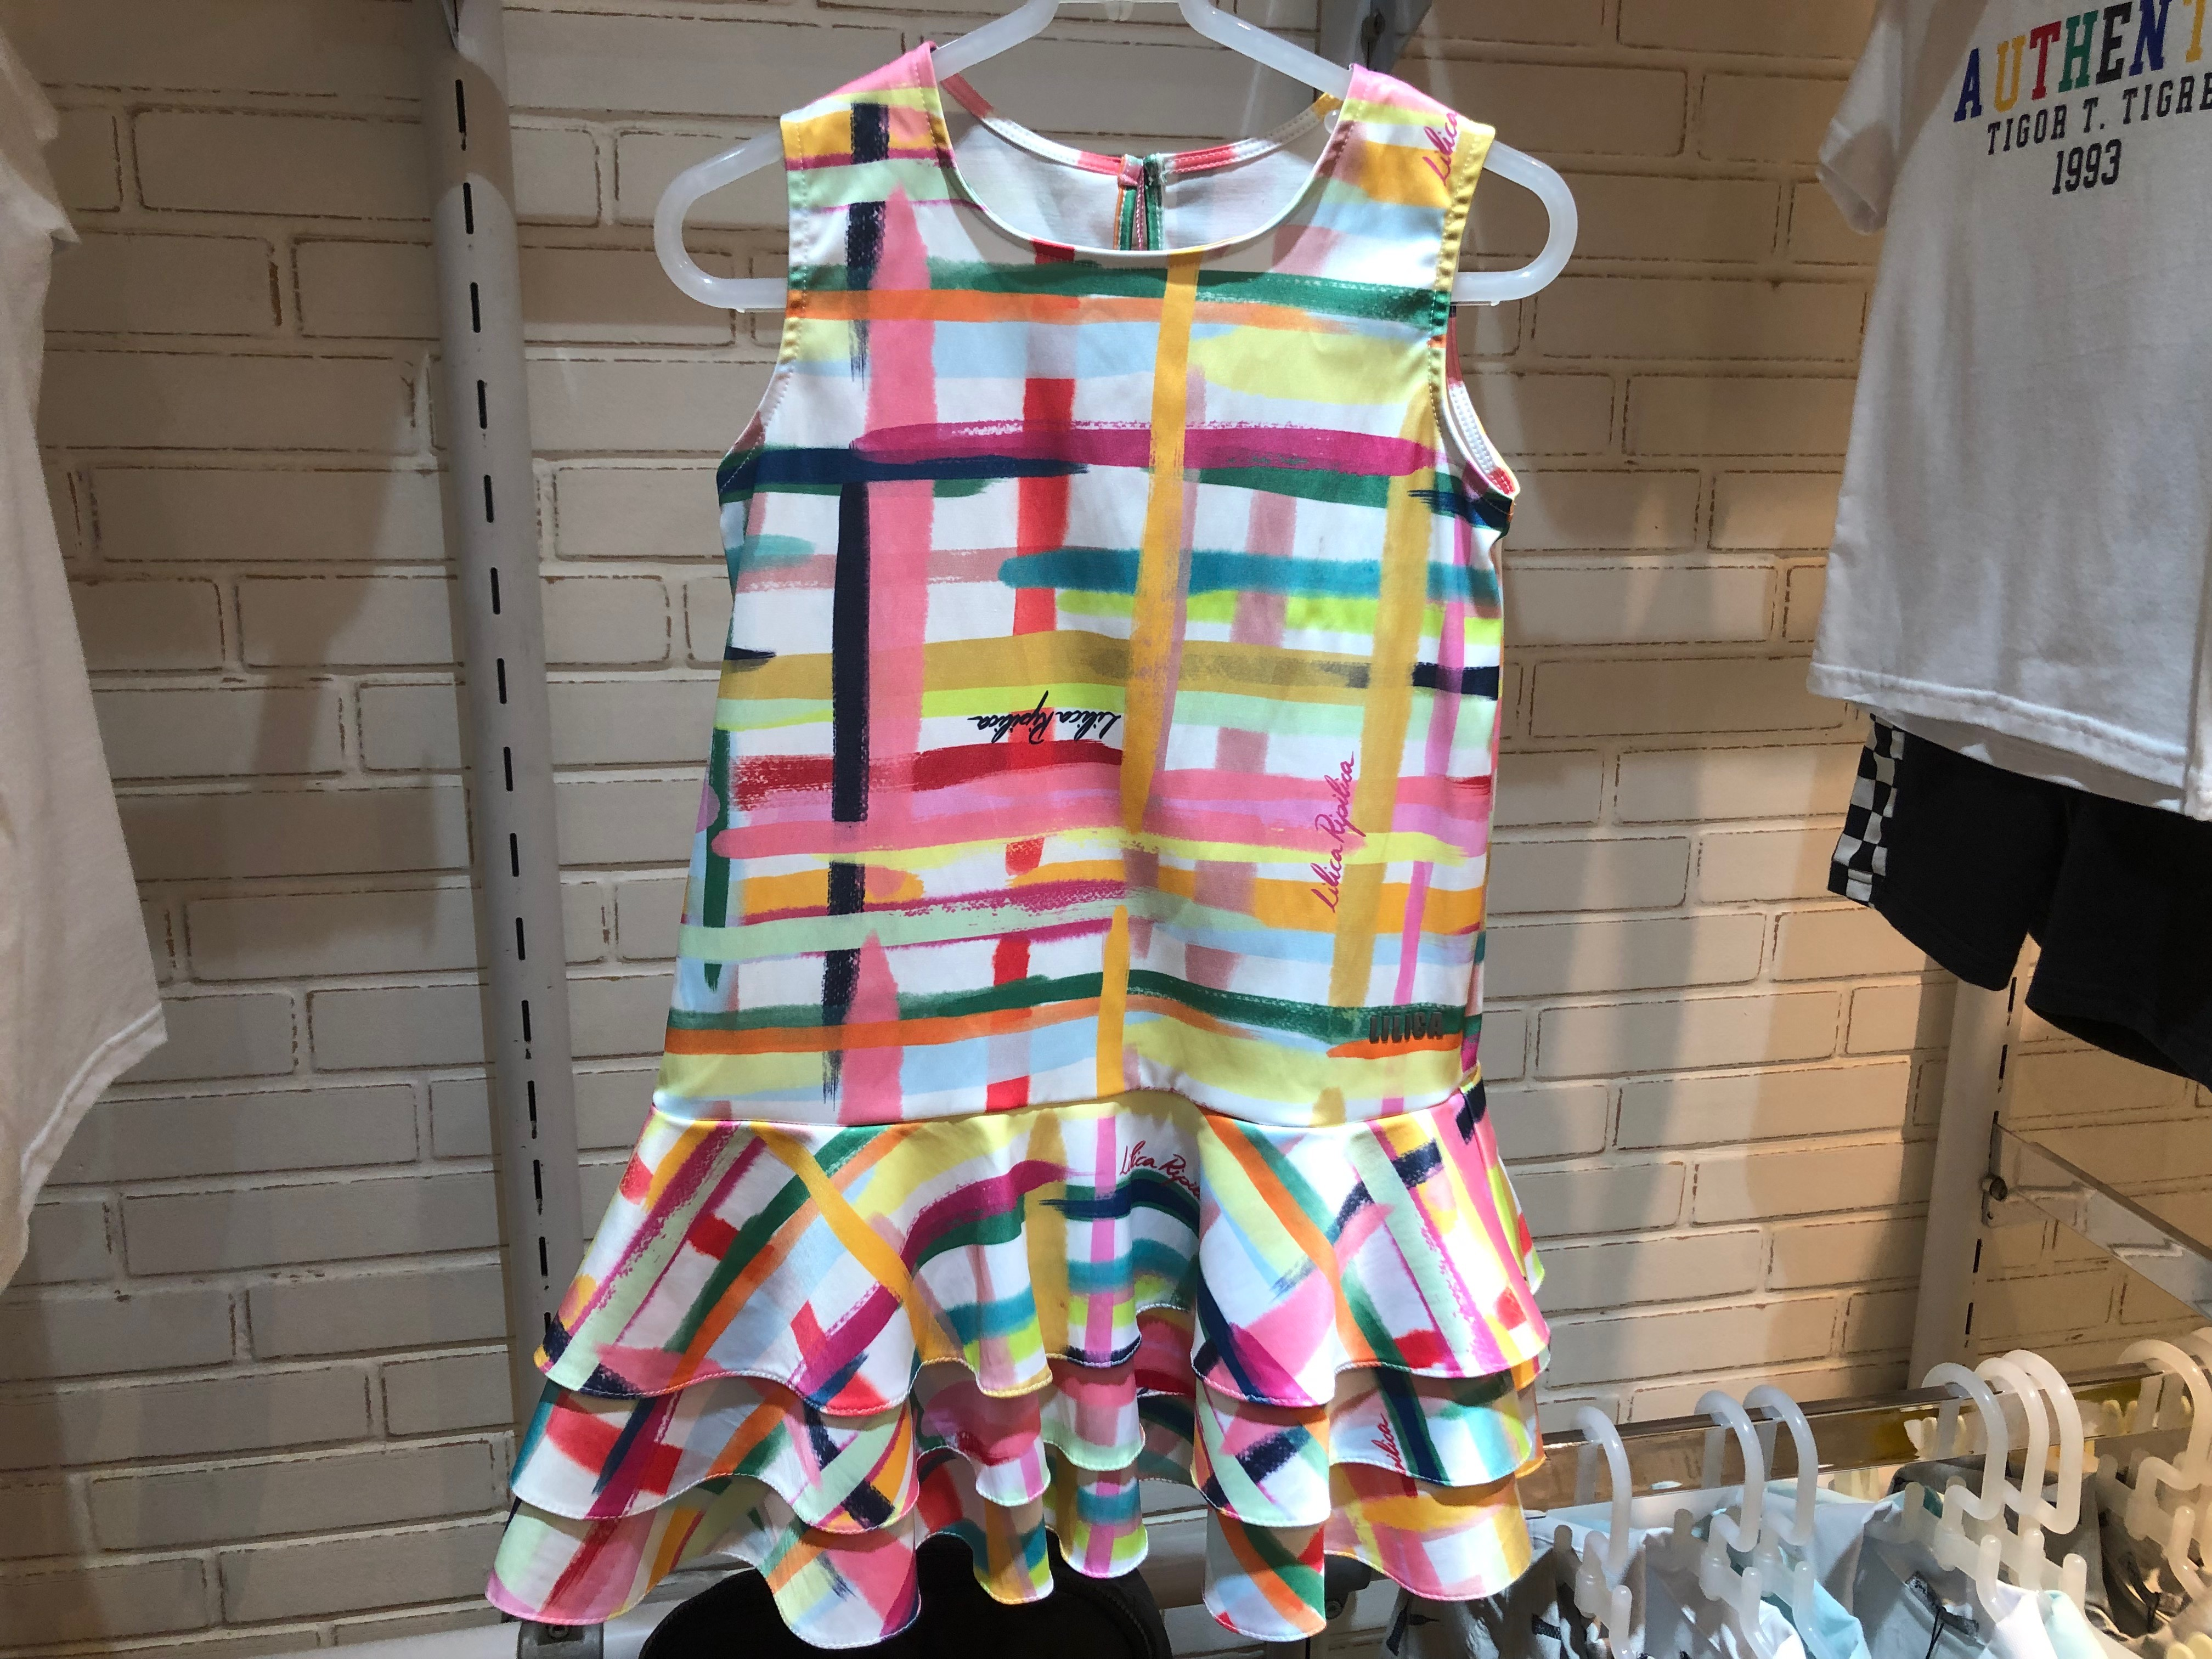 Vestido estampado (Lilica e Tigor - Salvador Shopping) de R$ 367 por R$ 183,5 (50%)